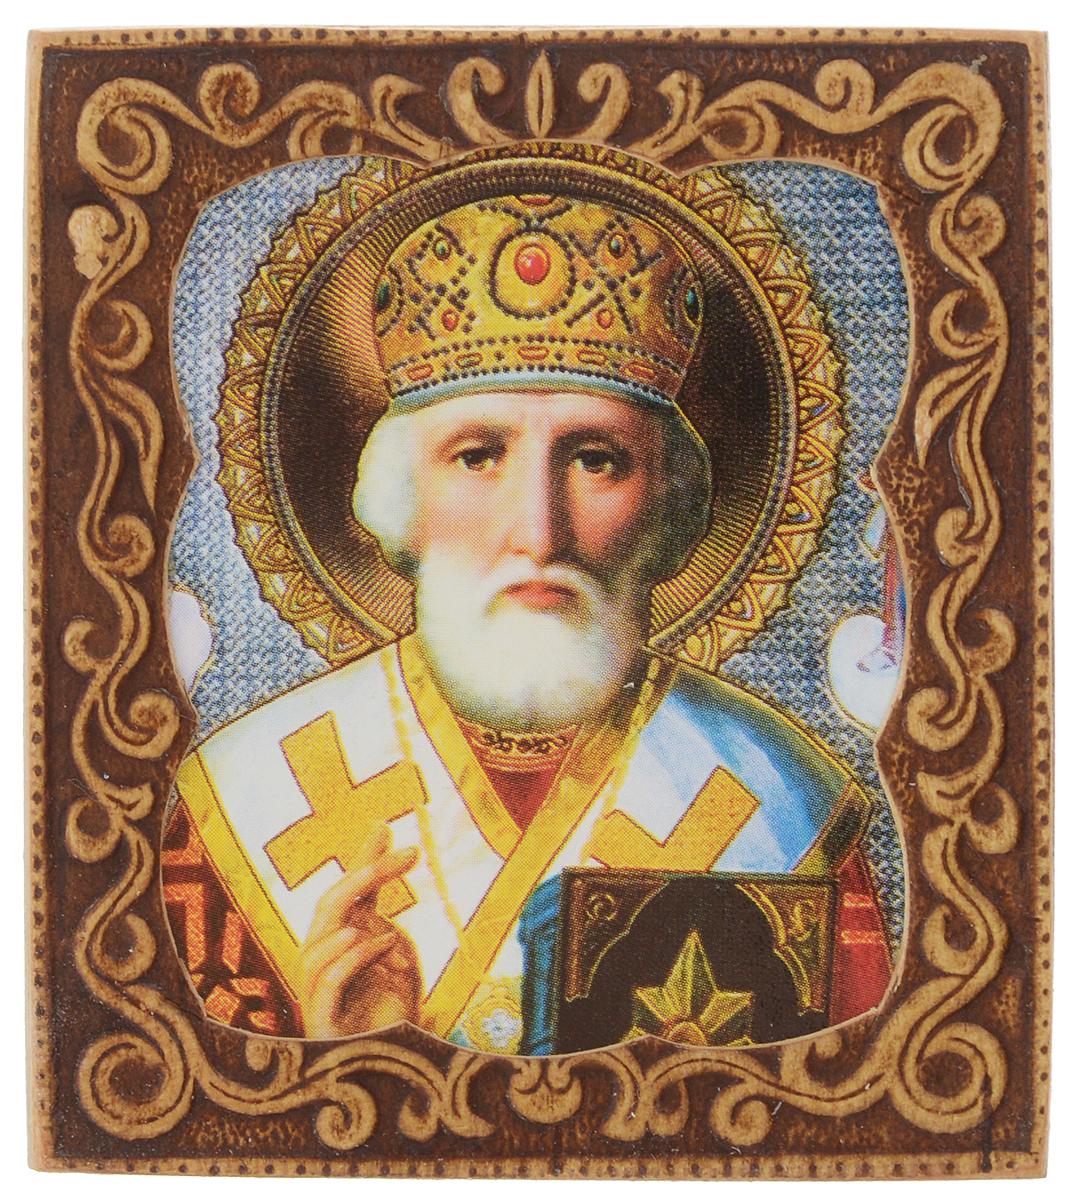 Икона Sima-land Святой Николай Чудотворец, 6 х 6,5 см икона янтарная богородица скоропослушница кян 2 305